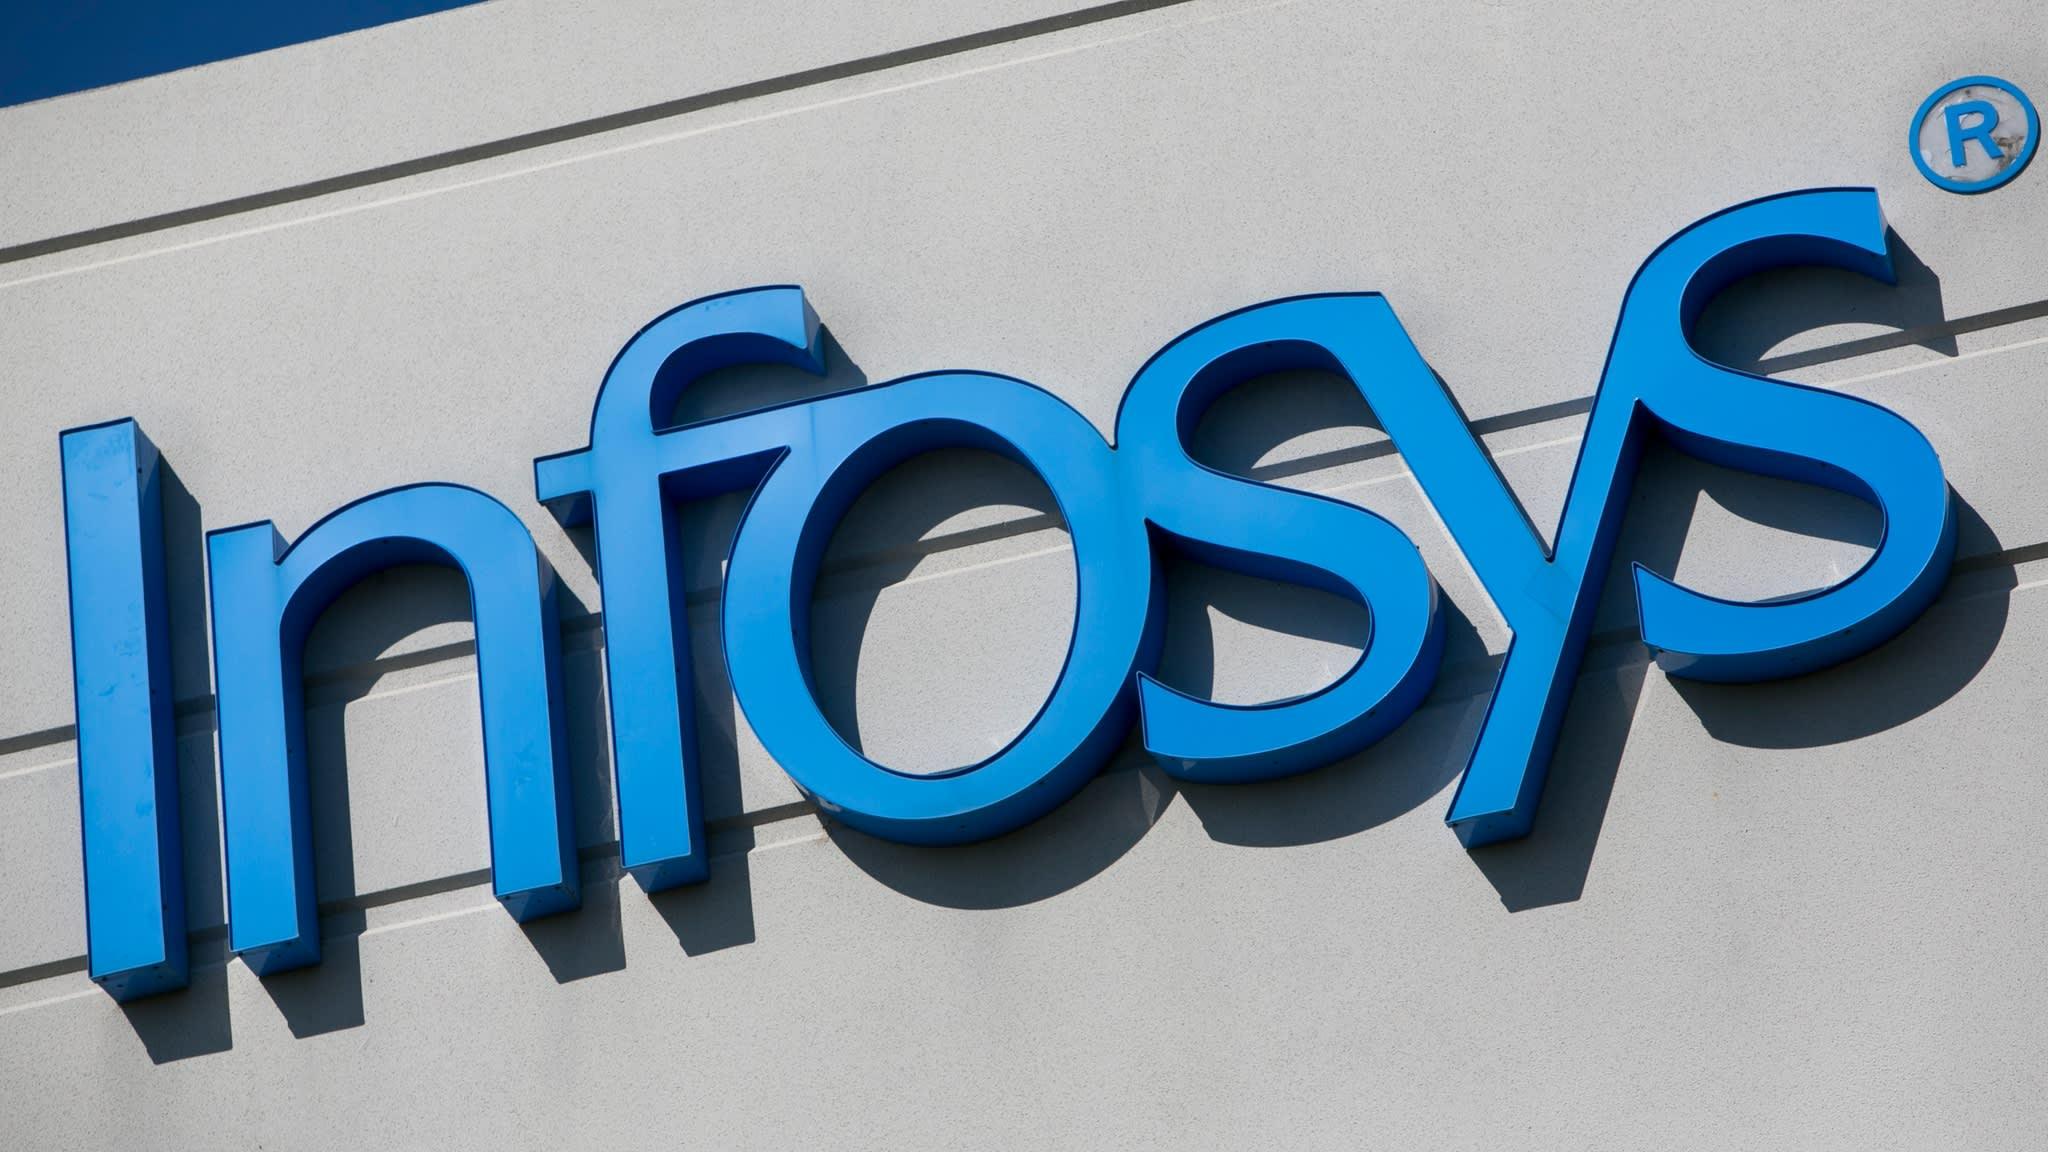 Infosys Quarterly Profit Beats Expectations Amid Large Deals